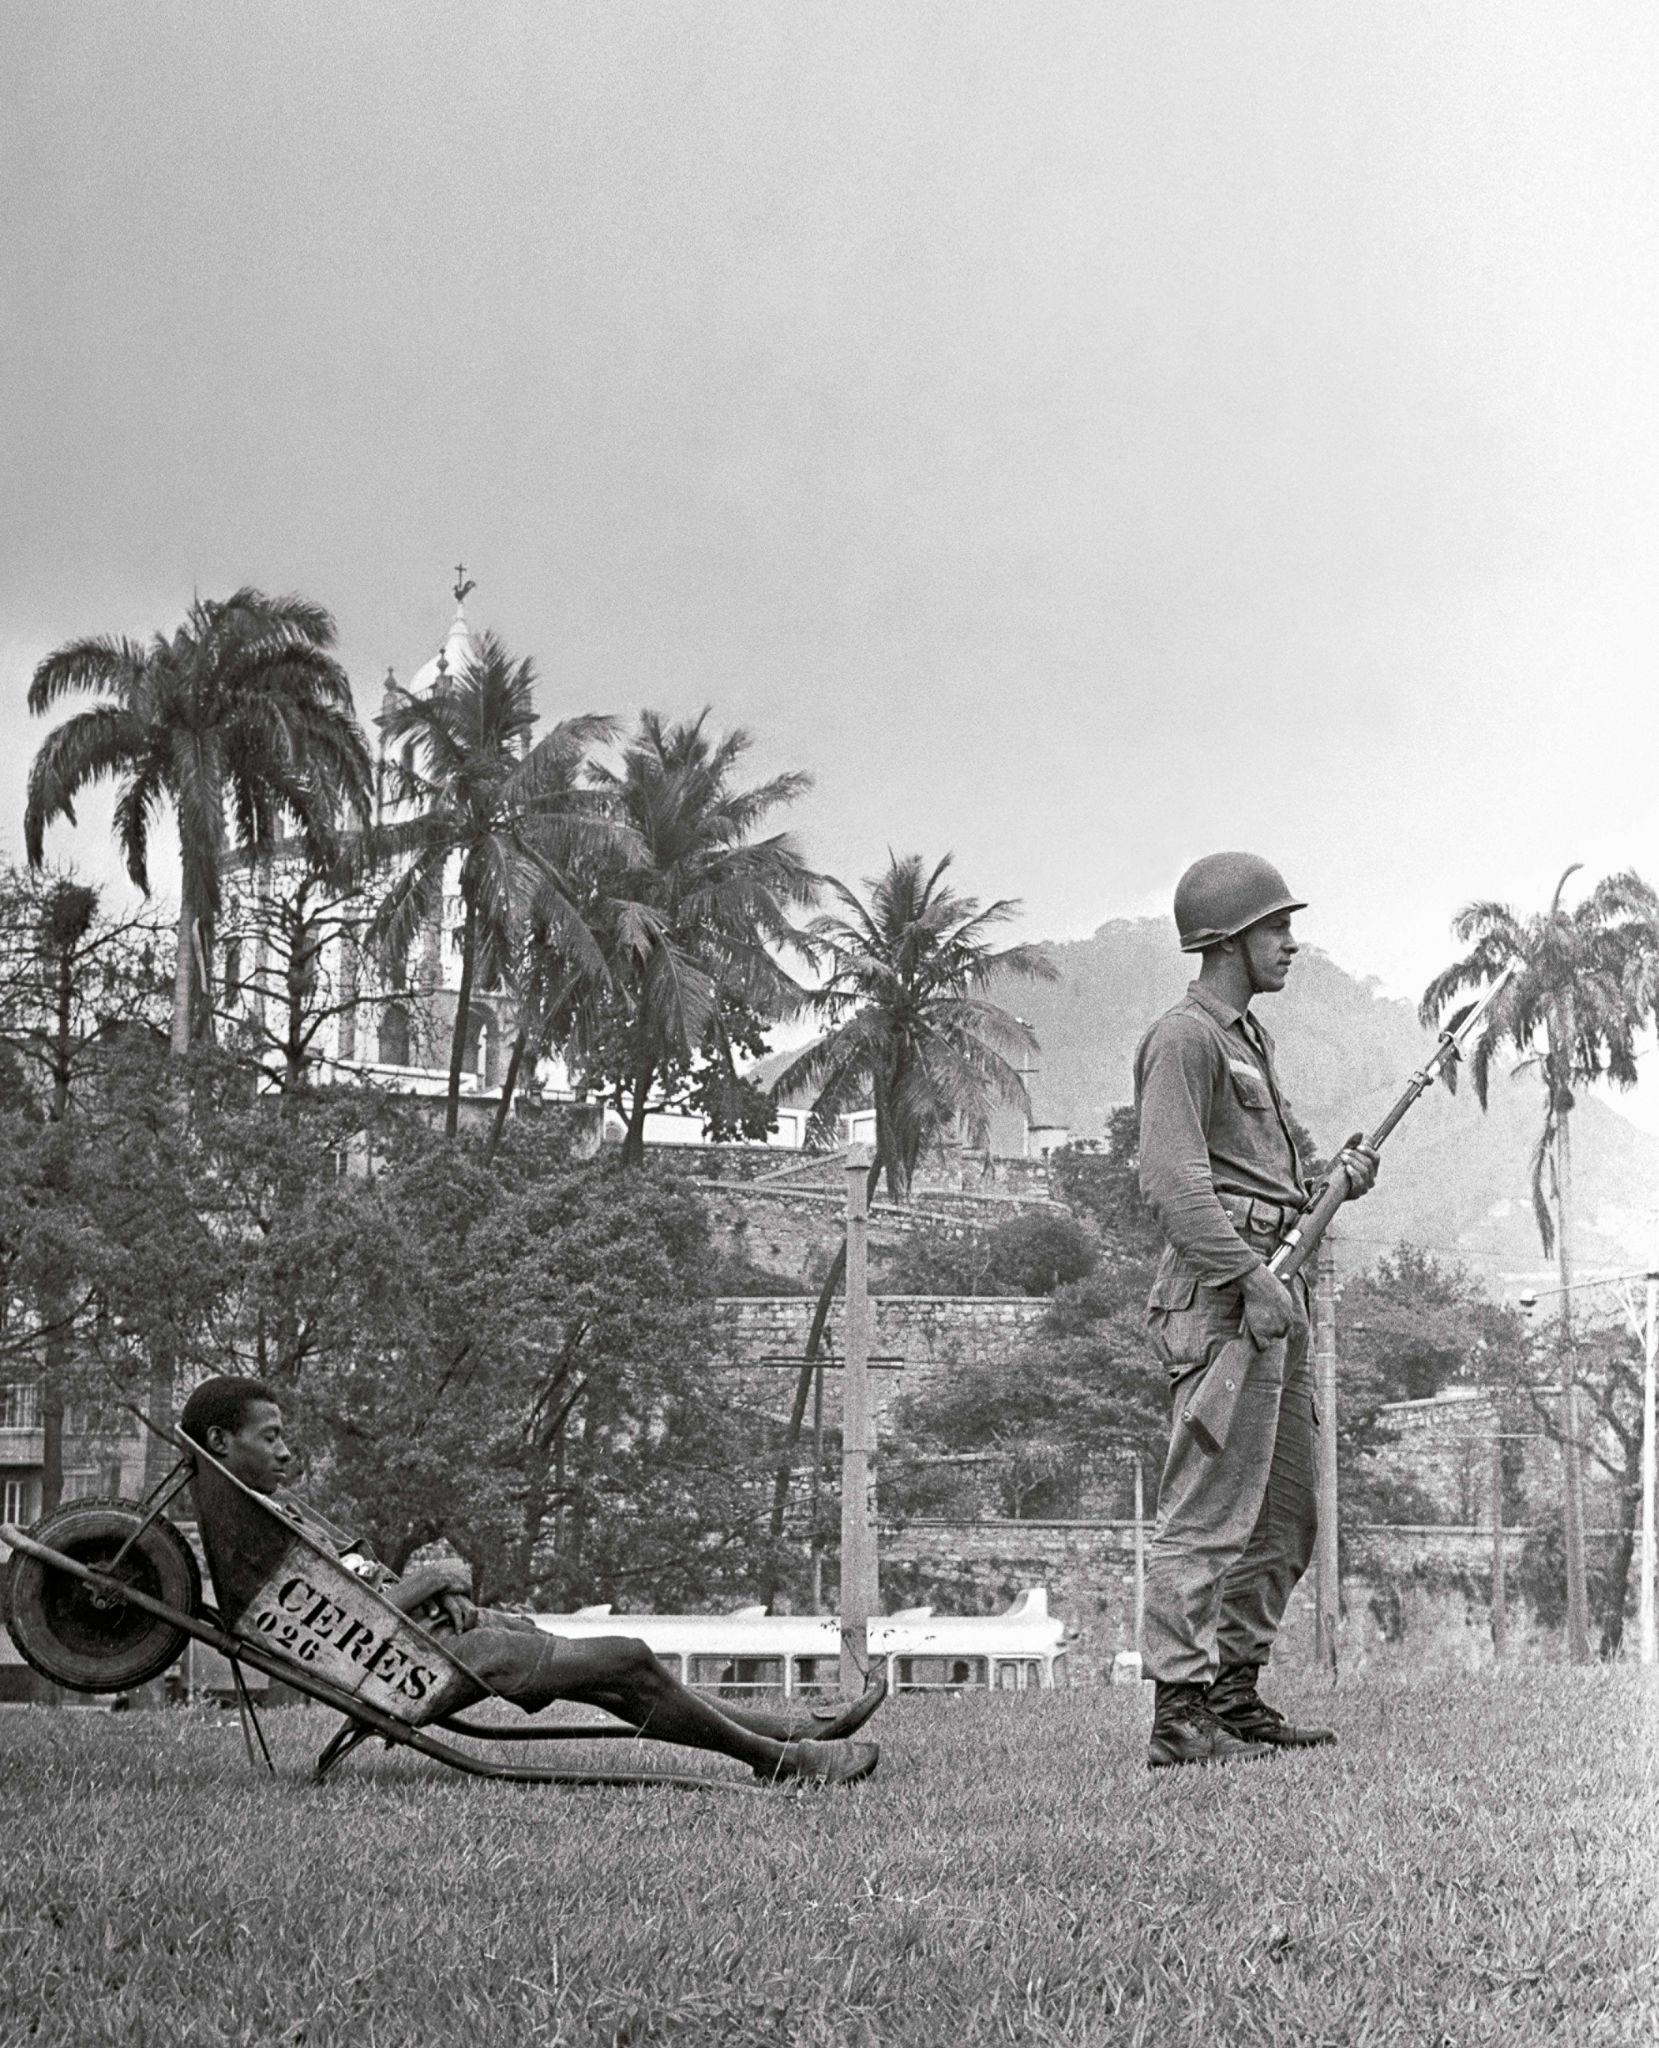 Movimento-Estudantil,-1968,-Evandro-Teixeira